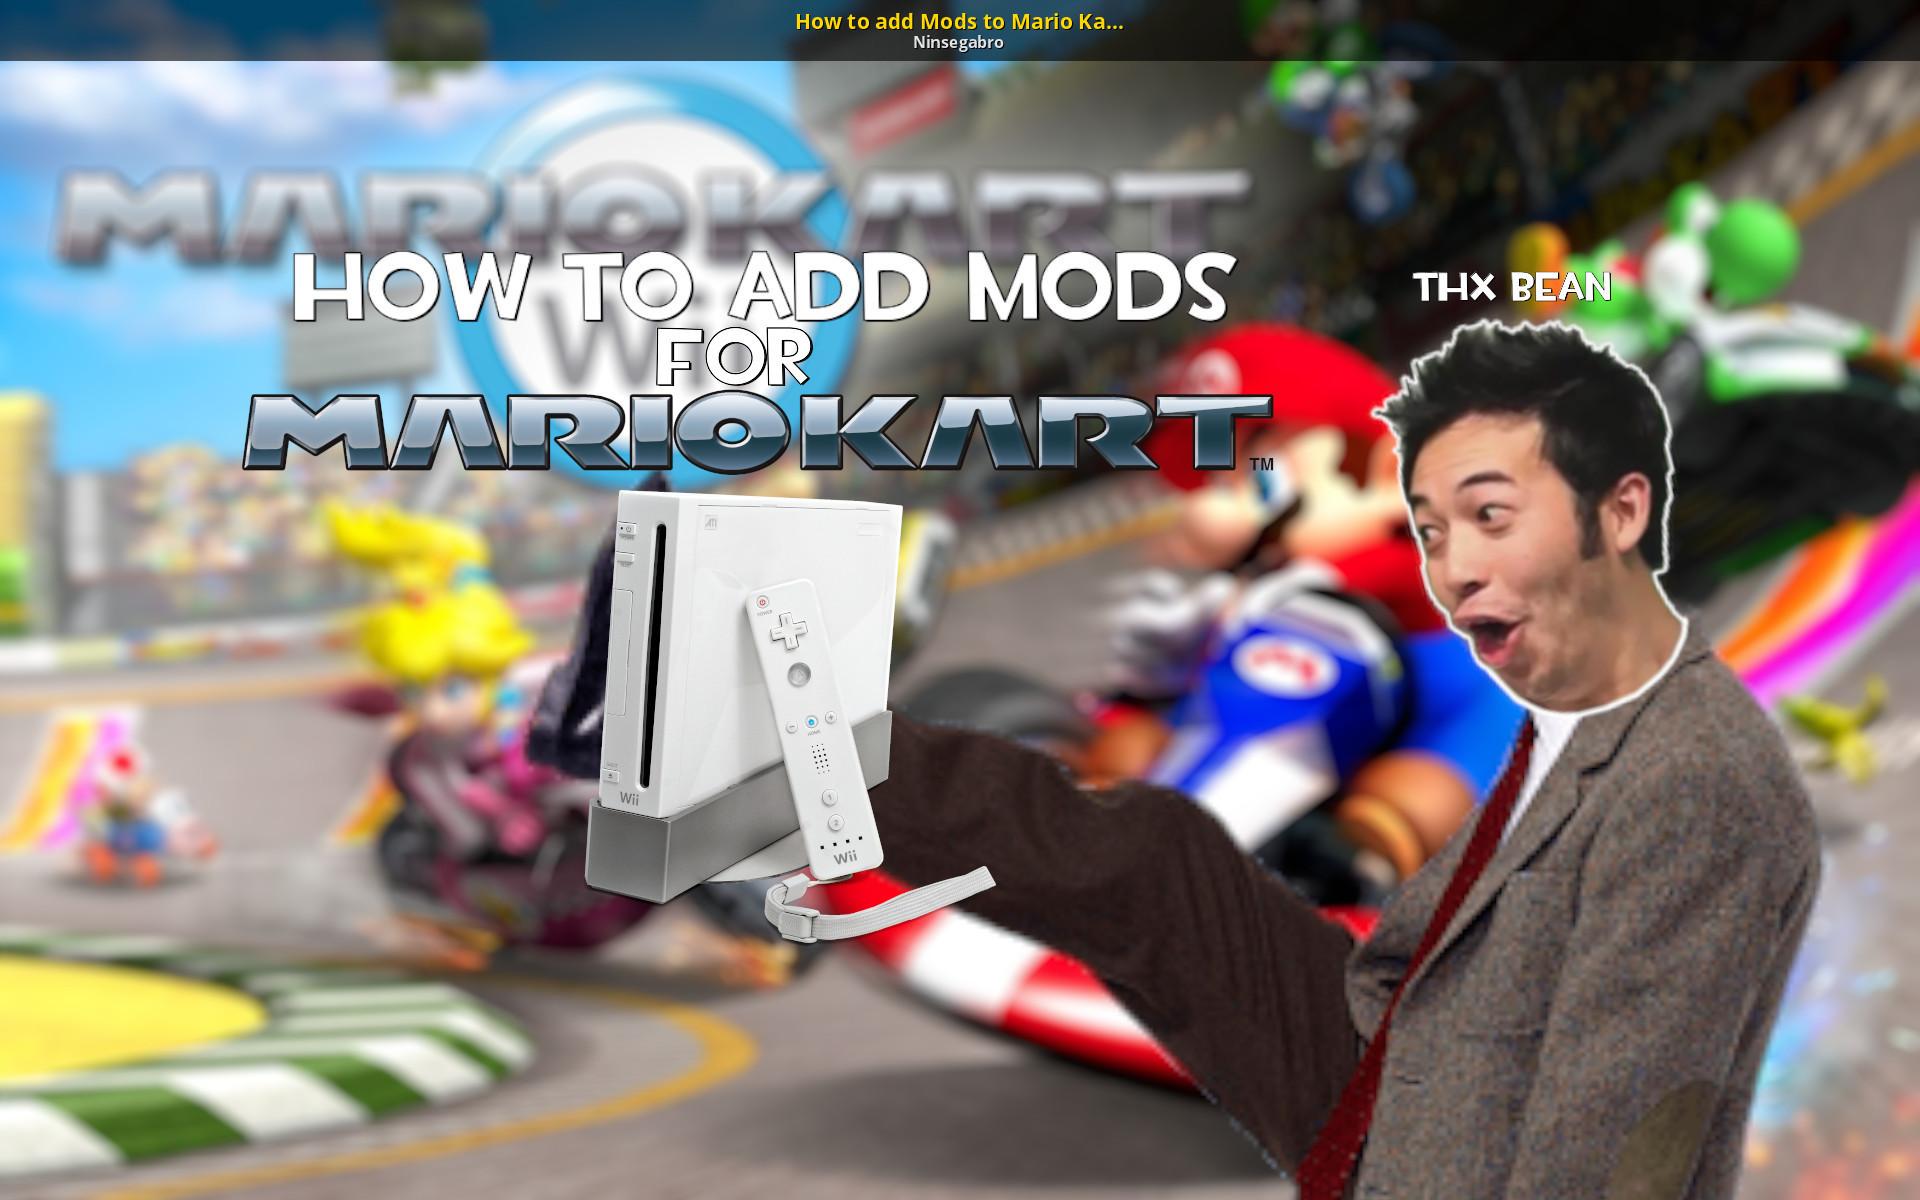 How to add Mods to Mario kart Wii [Mario Kart Wii] [Tutorials]